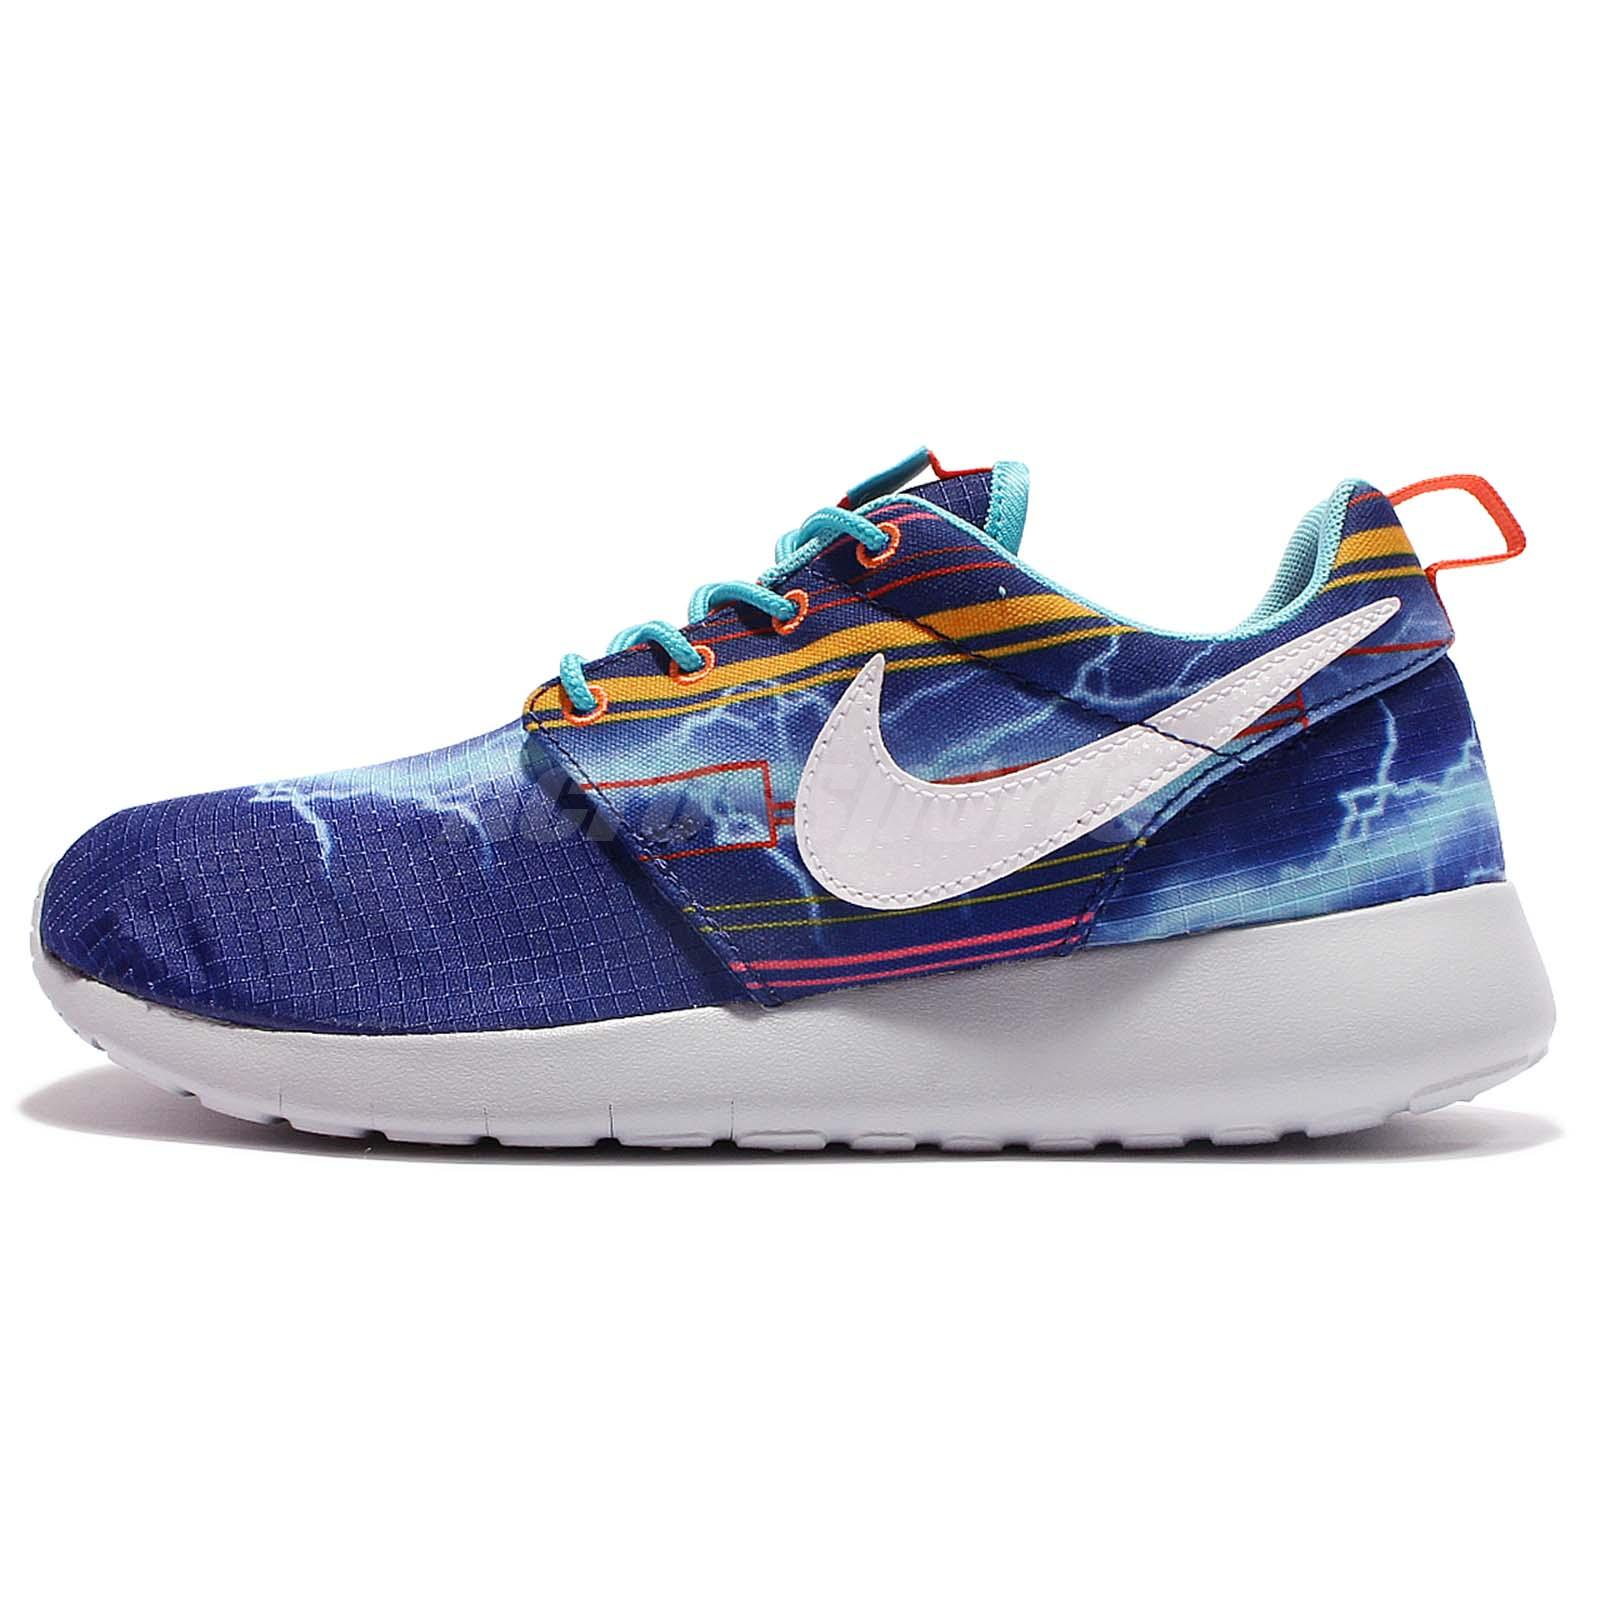 76eb025249525 ... Nike Roshe One Print GS Kids Youth Boys Girls Running Shoes Blue  677782-401 ...